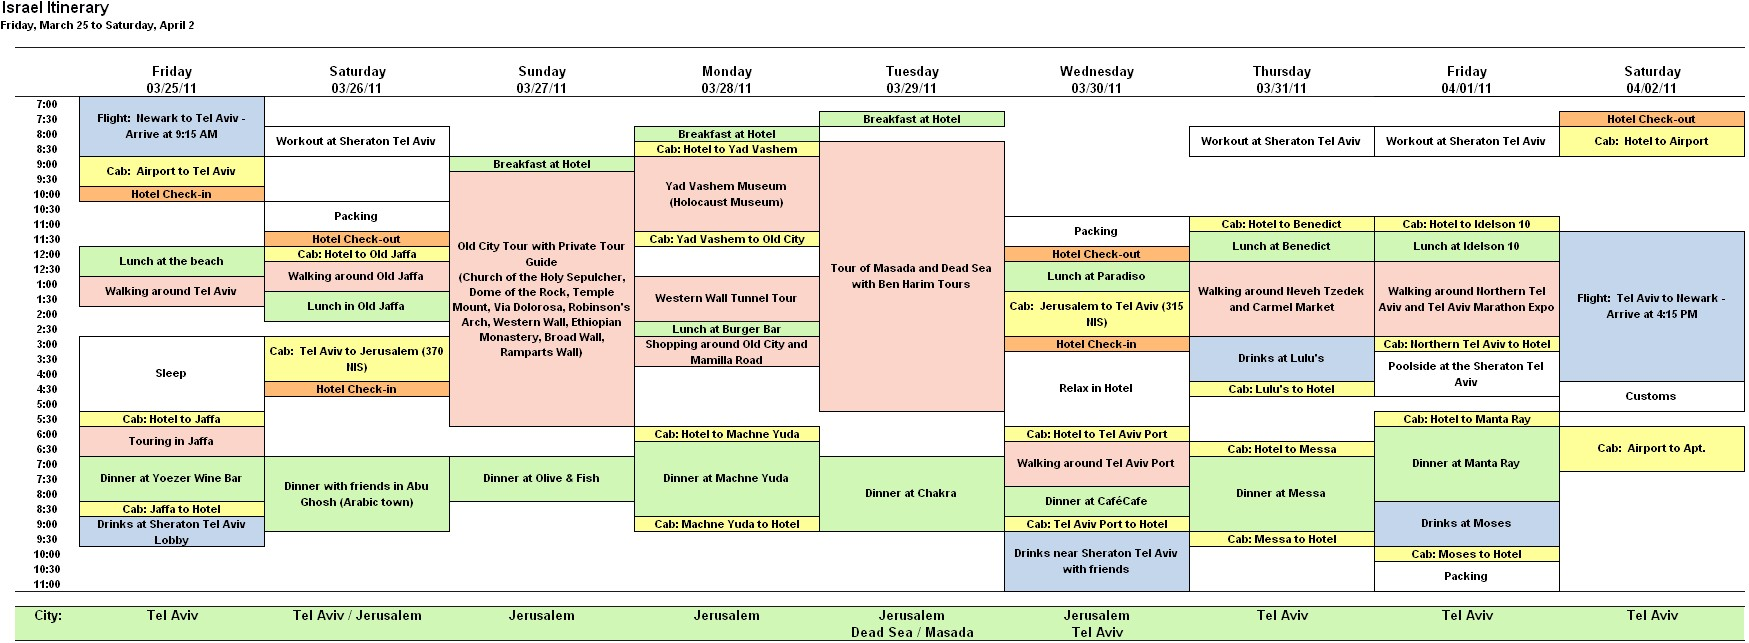 5 day calendar template excel  Travel Schedule Template Excel – printable schedule template - 5 day calendar template excel